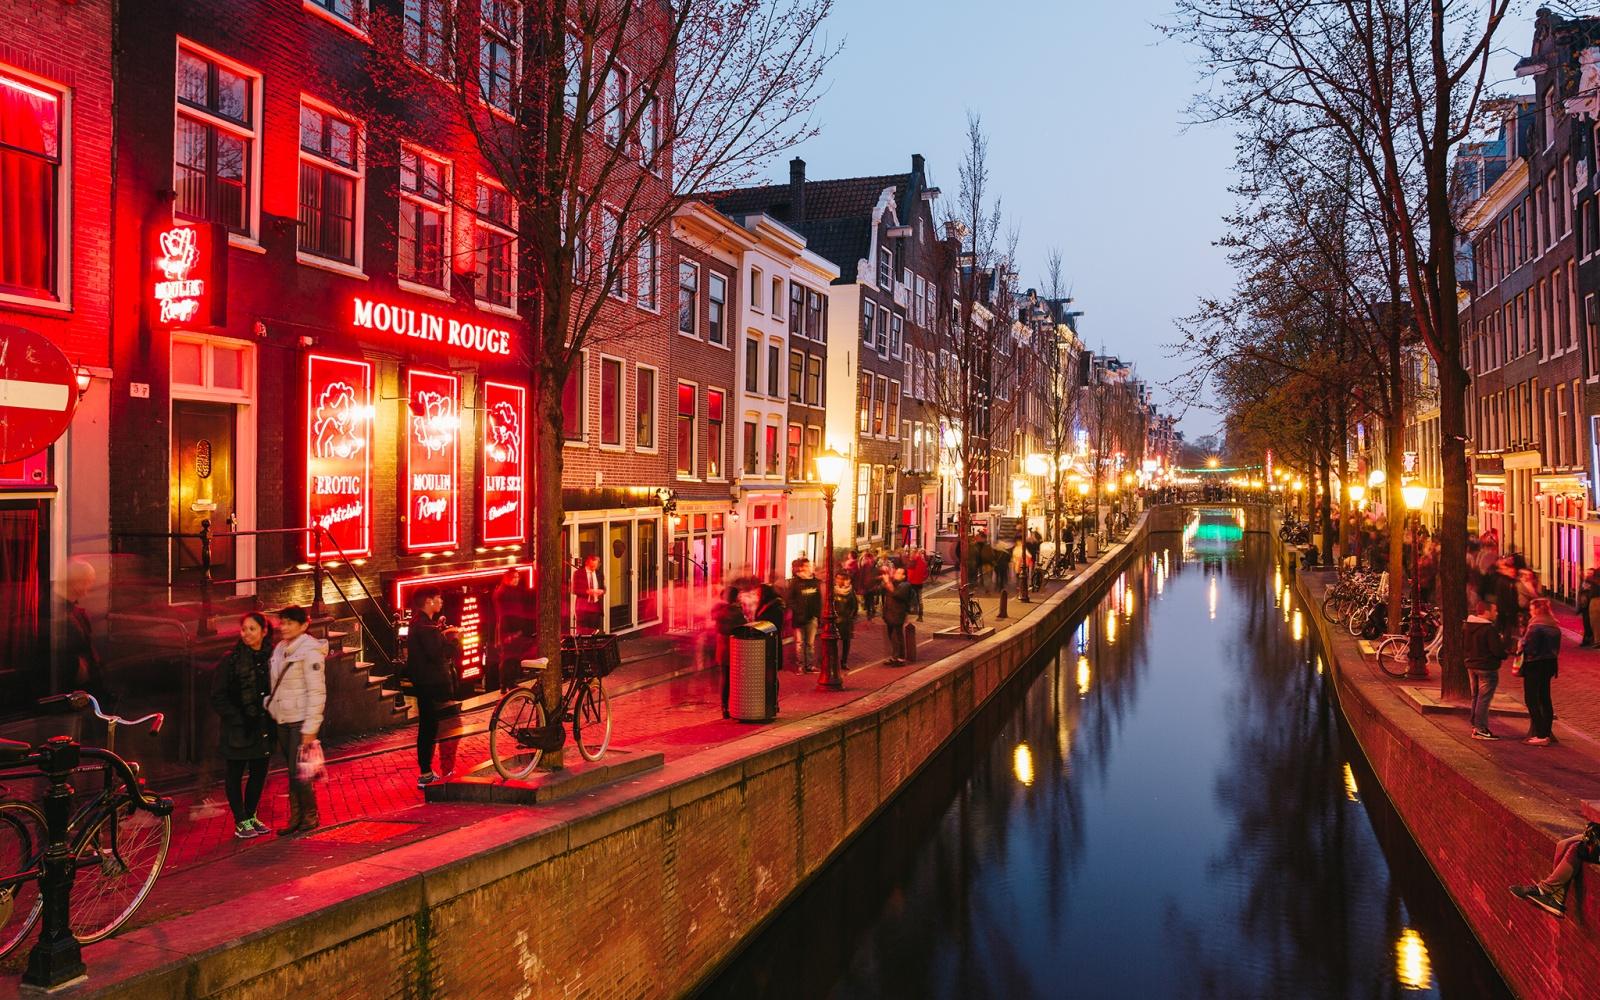 Quartiere a luci rosse amstredam tours for Dormire a amsterdam consigli